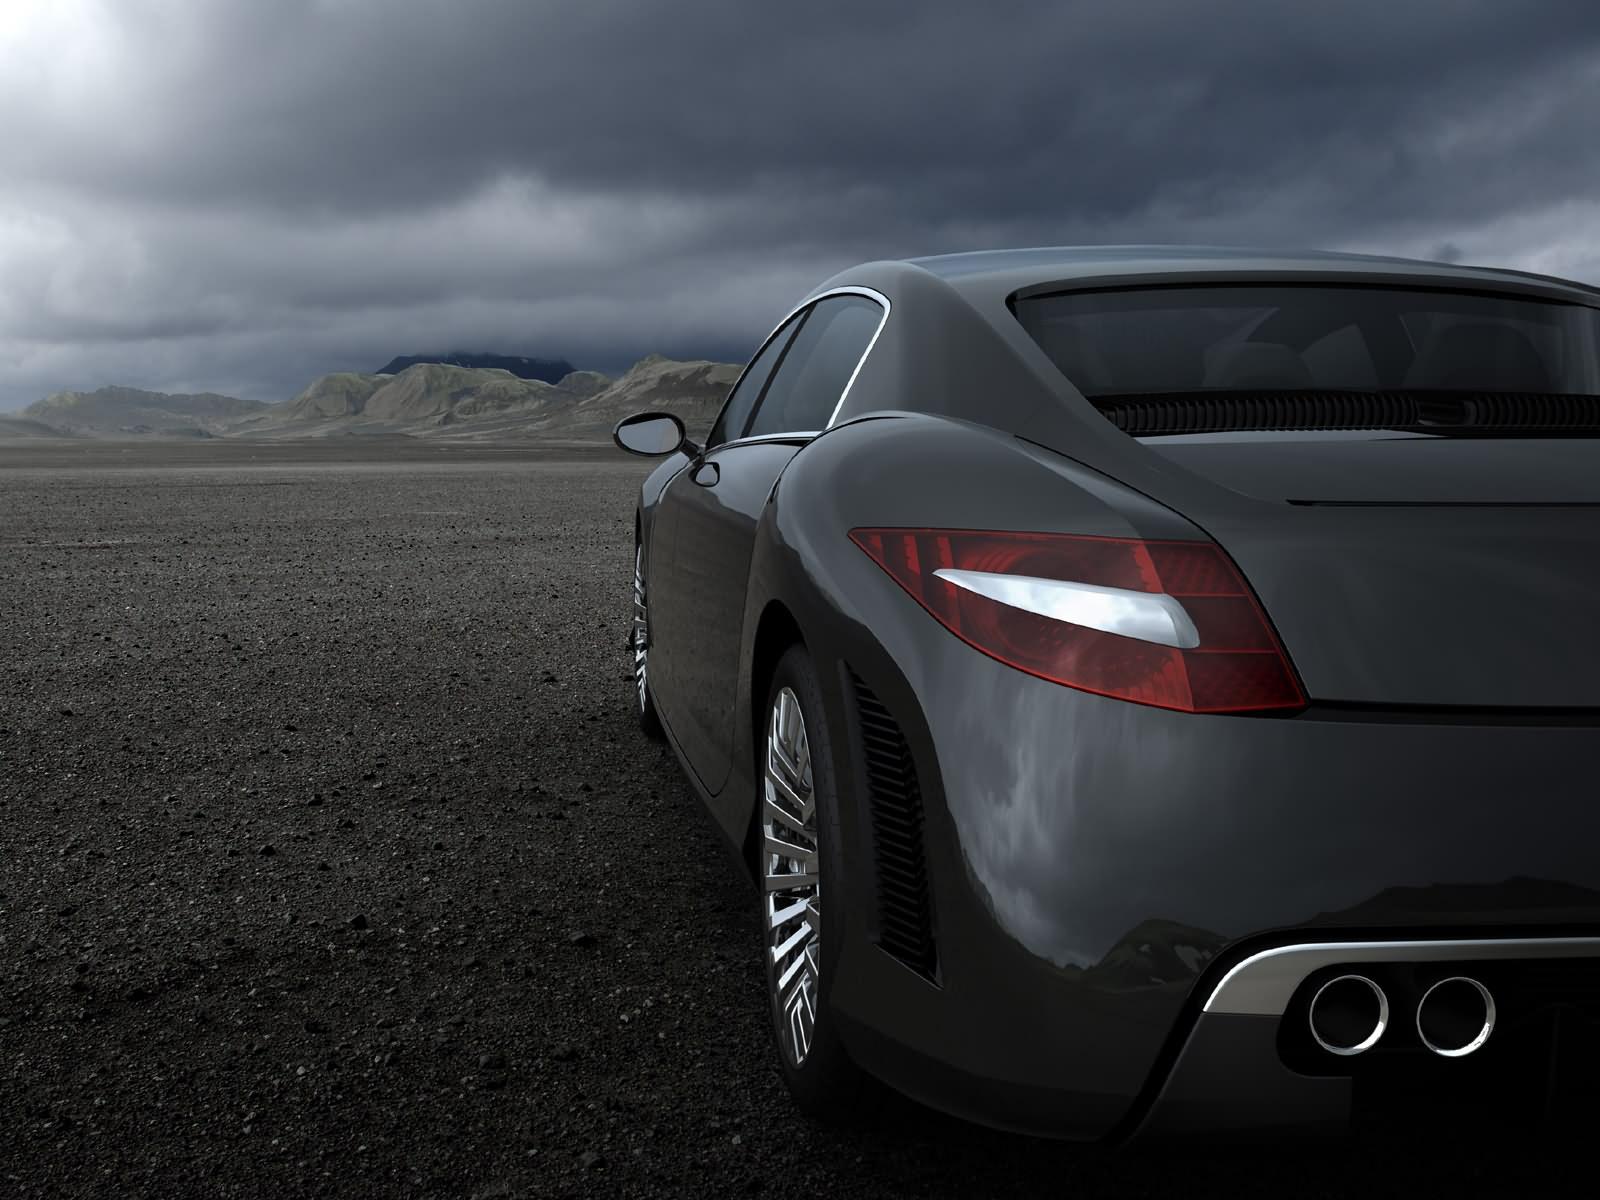 http://3.bp.blogspot.com/-PMznySU13dM/UBMOdjbTwcI/AAAAAAAAA60/2a8A0q7ZgEs/s1600/cars_0016.jpg